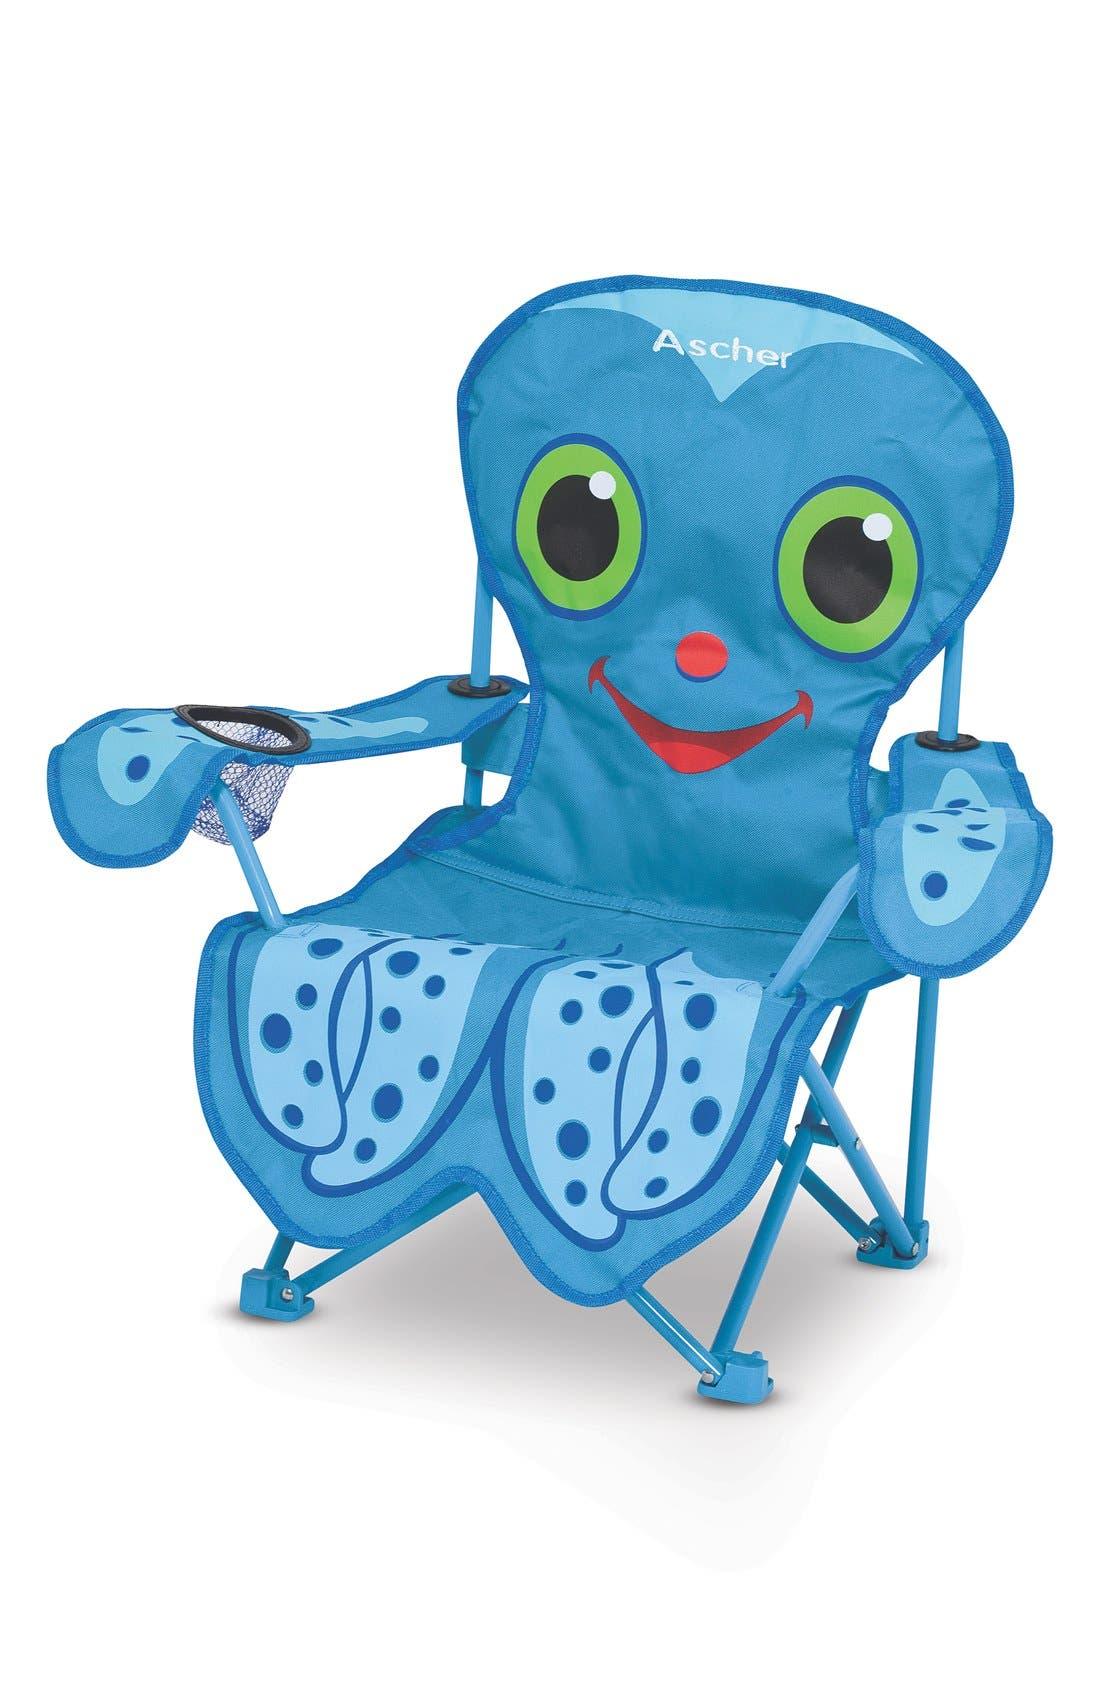 'Flex Octopus' Personalized Folding Chair,                             Main thumbnail 1, color,                             Blue